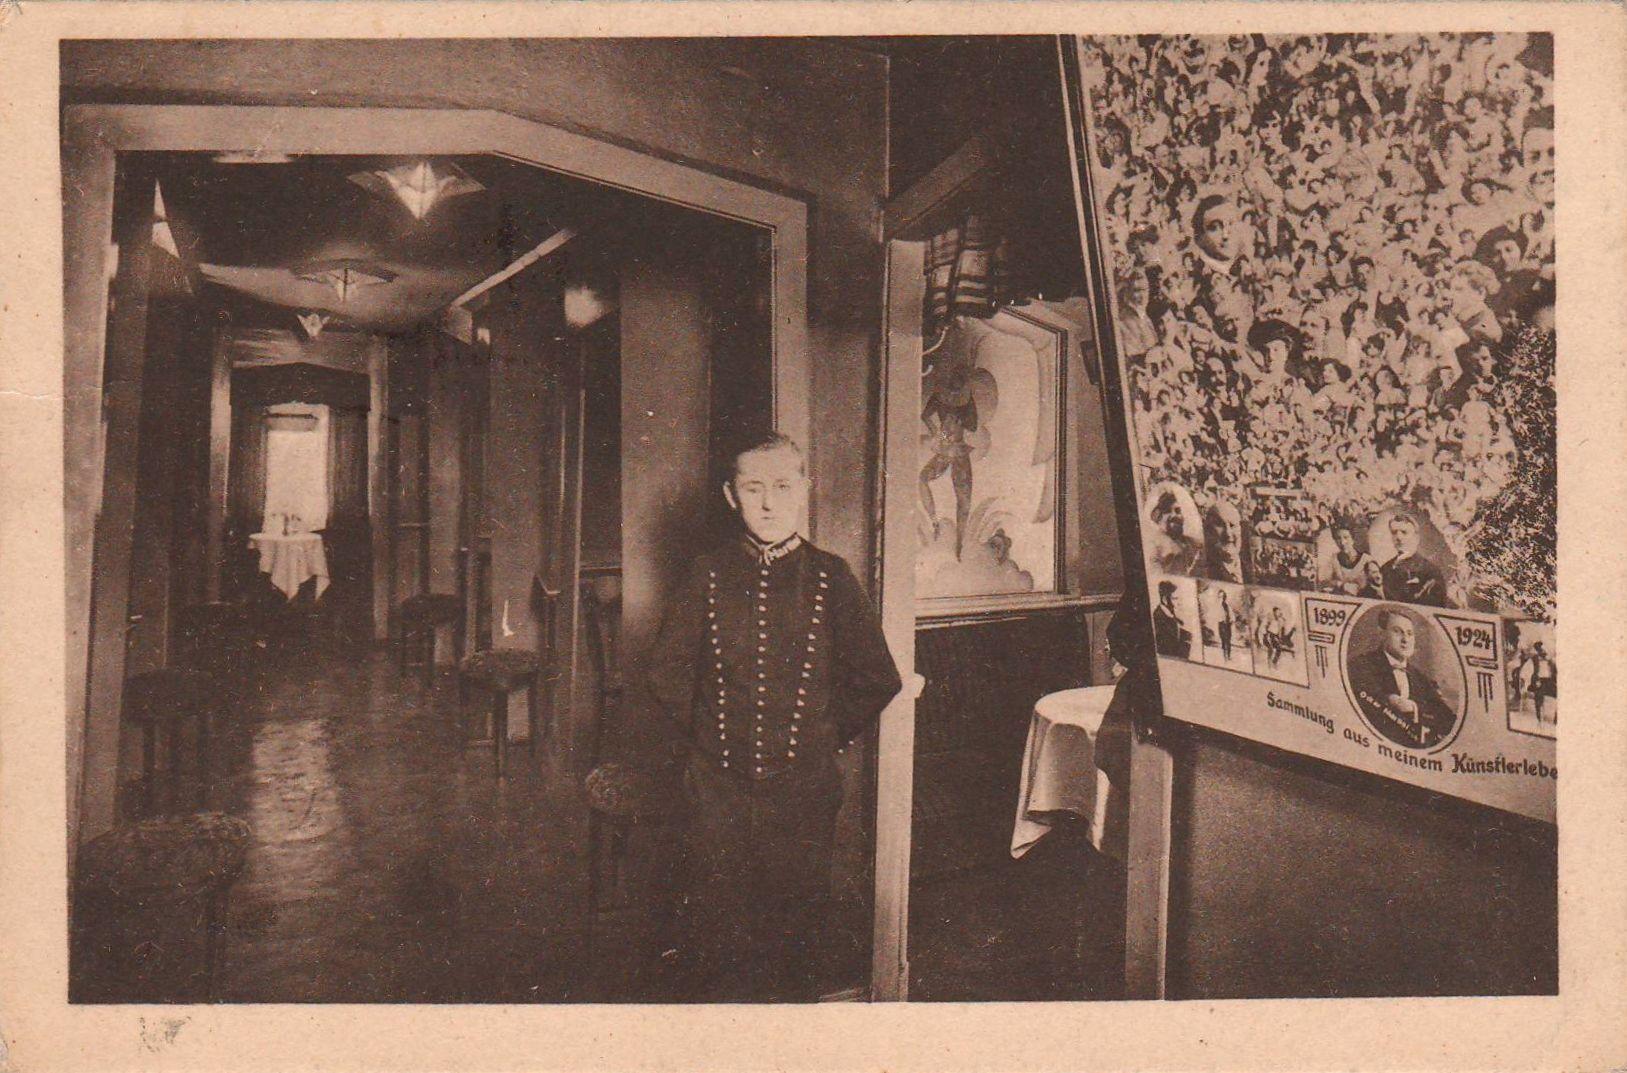 Unknown architect - Cafe Martini, Hamburg, 1929